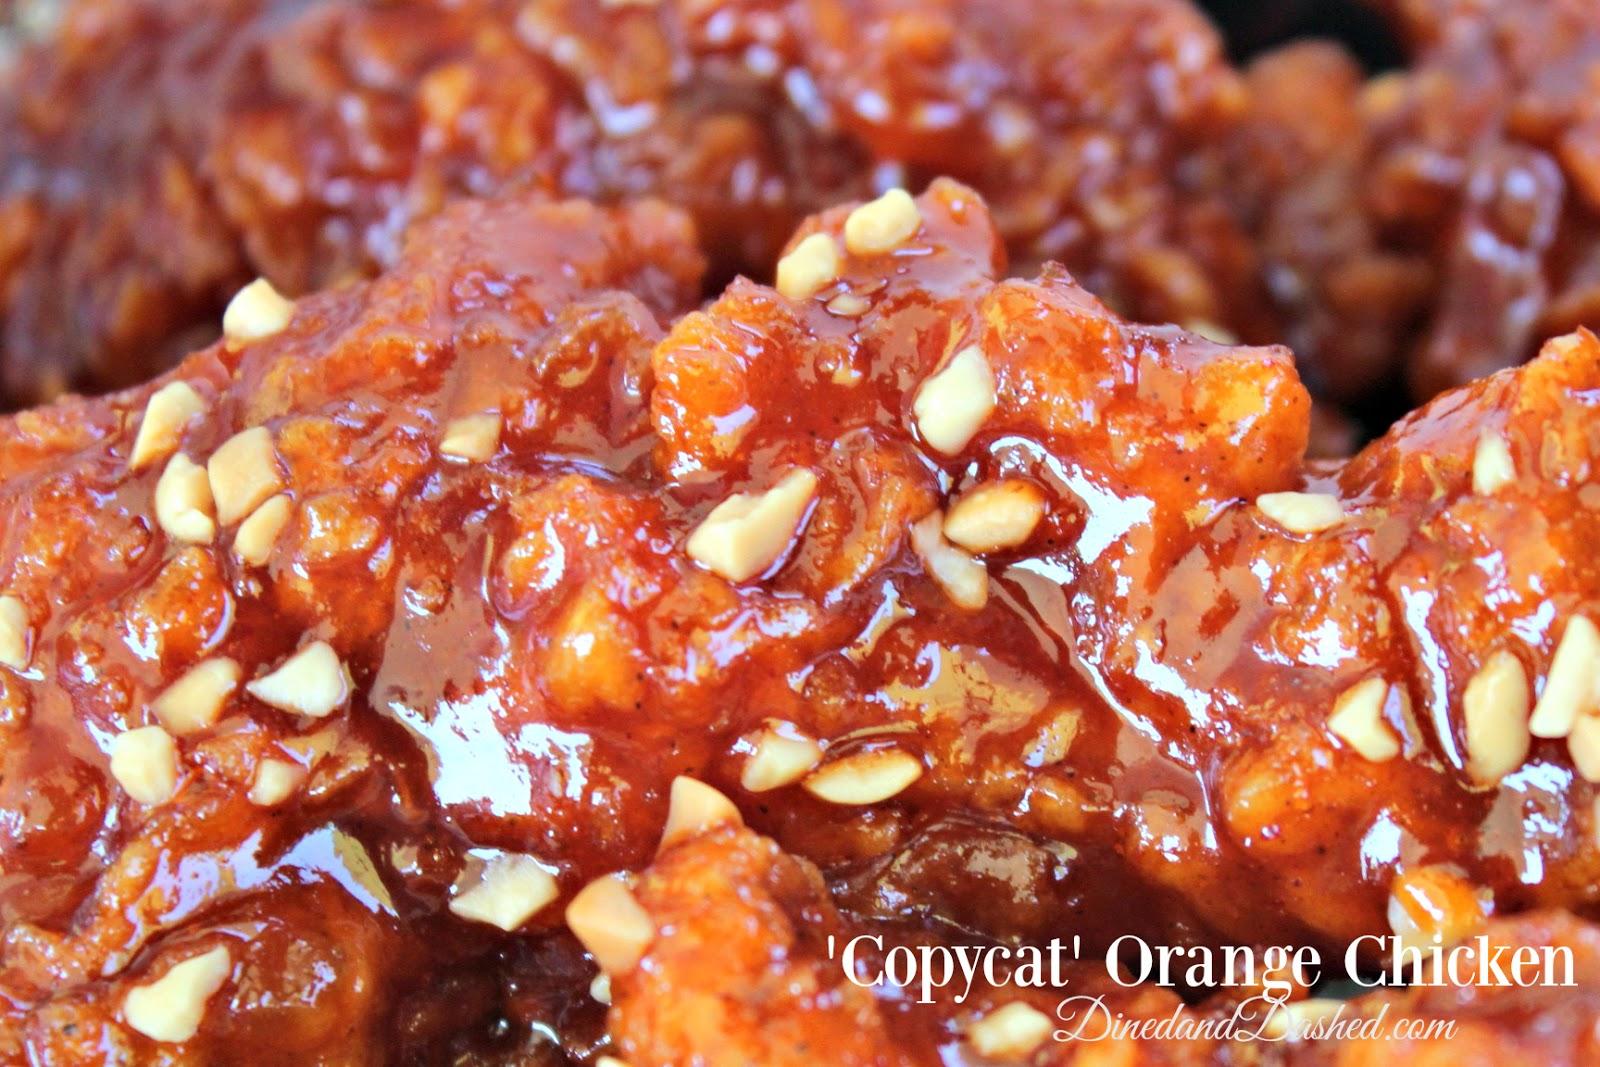 'Copycat' Orange Chicken Recipe